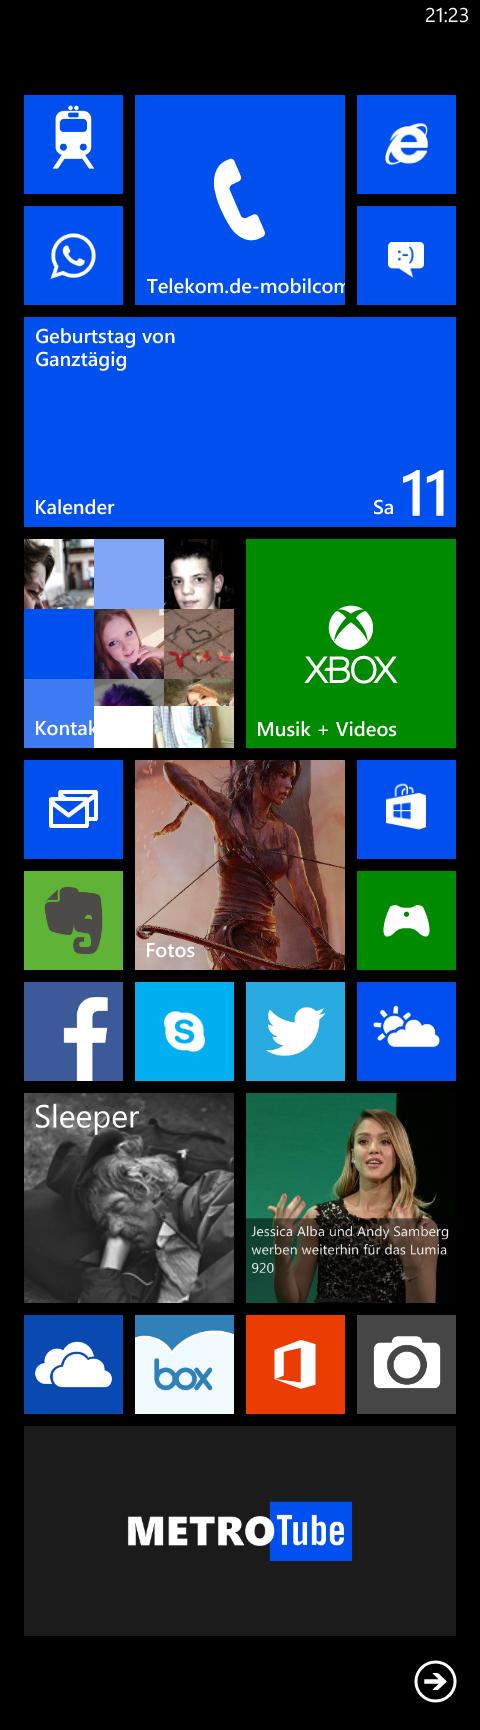 http://abload.de/img/windowsphone_screenkfxyh.jpg